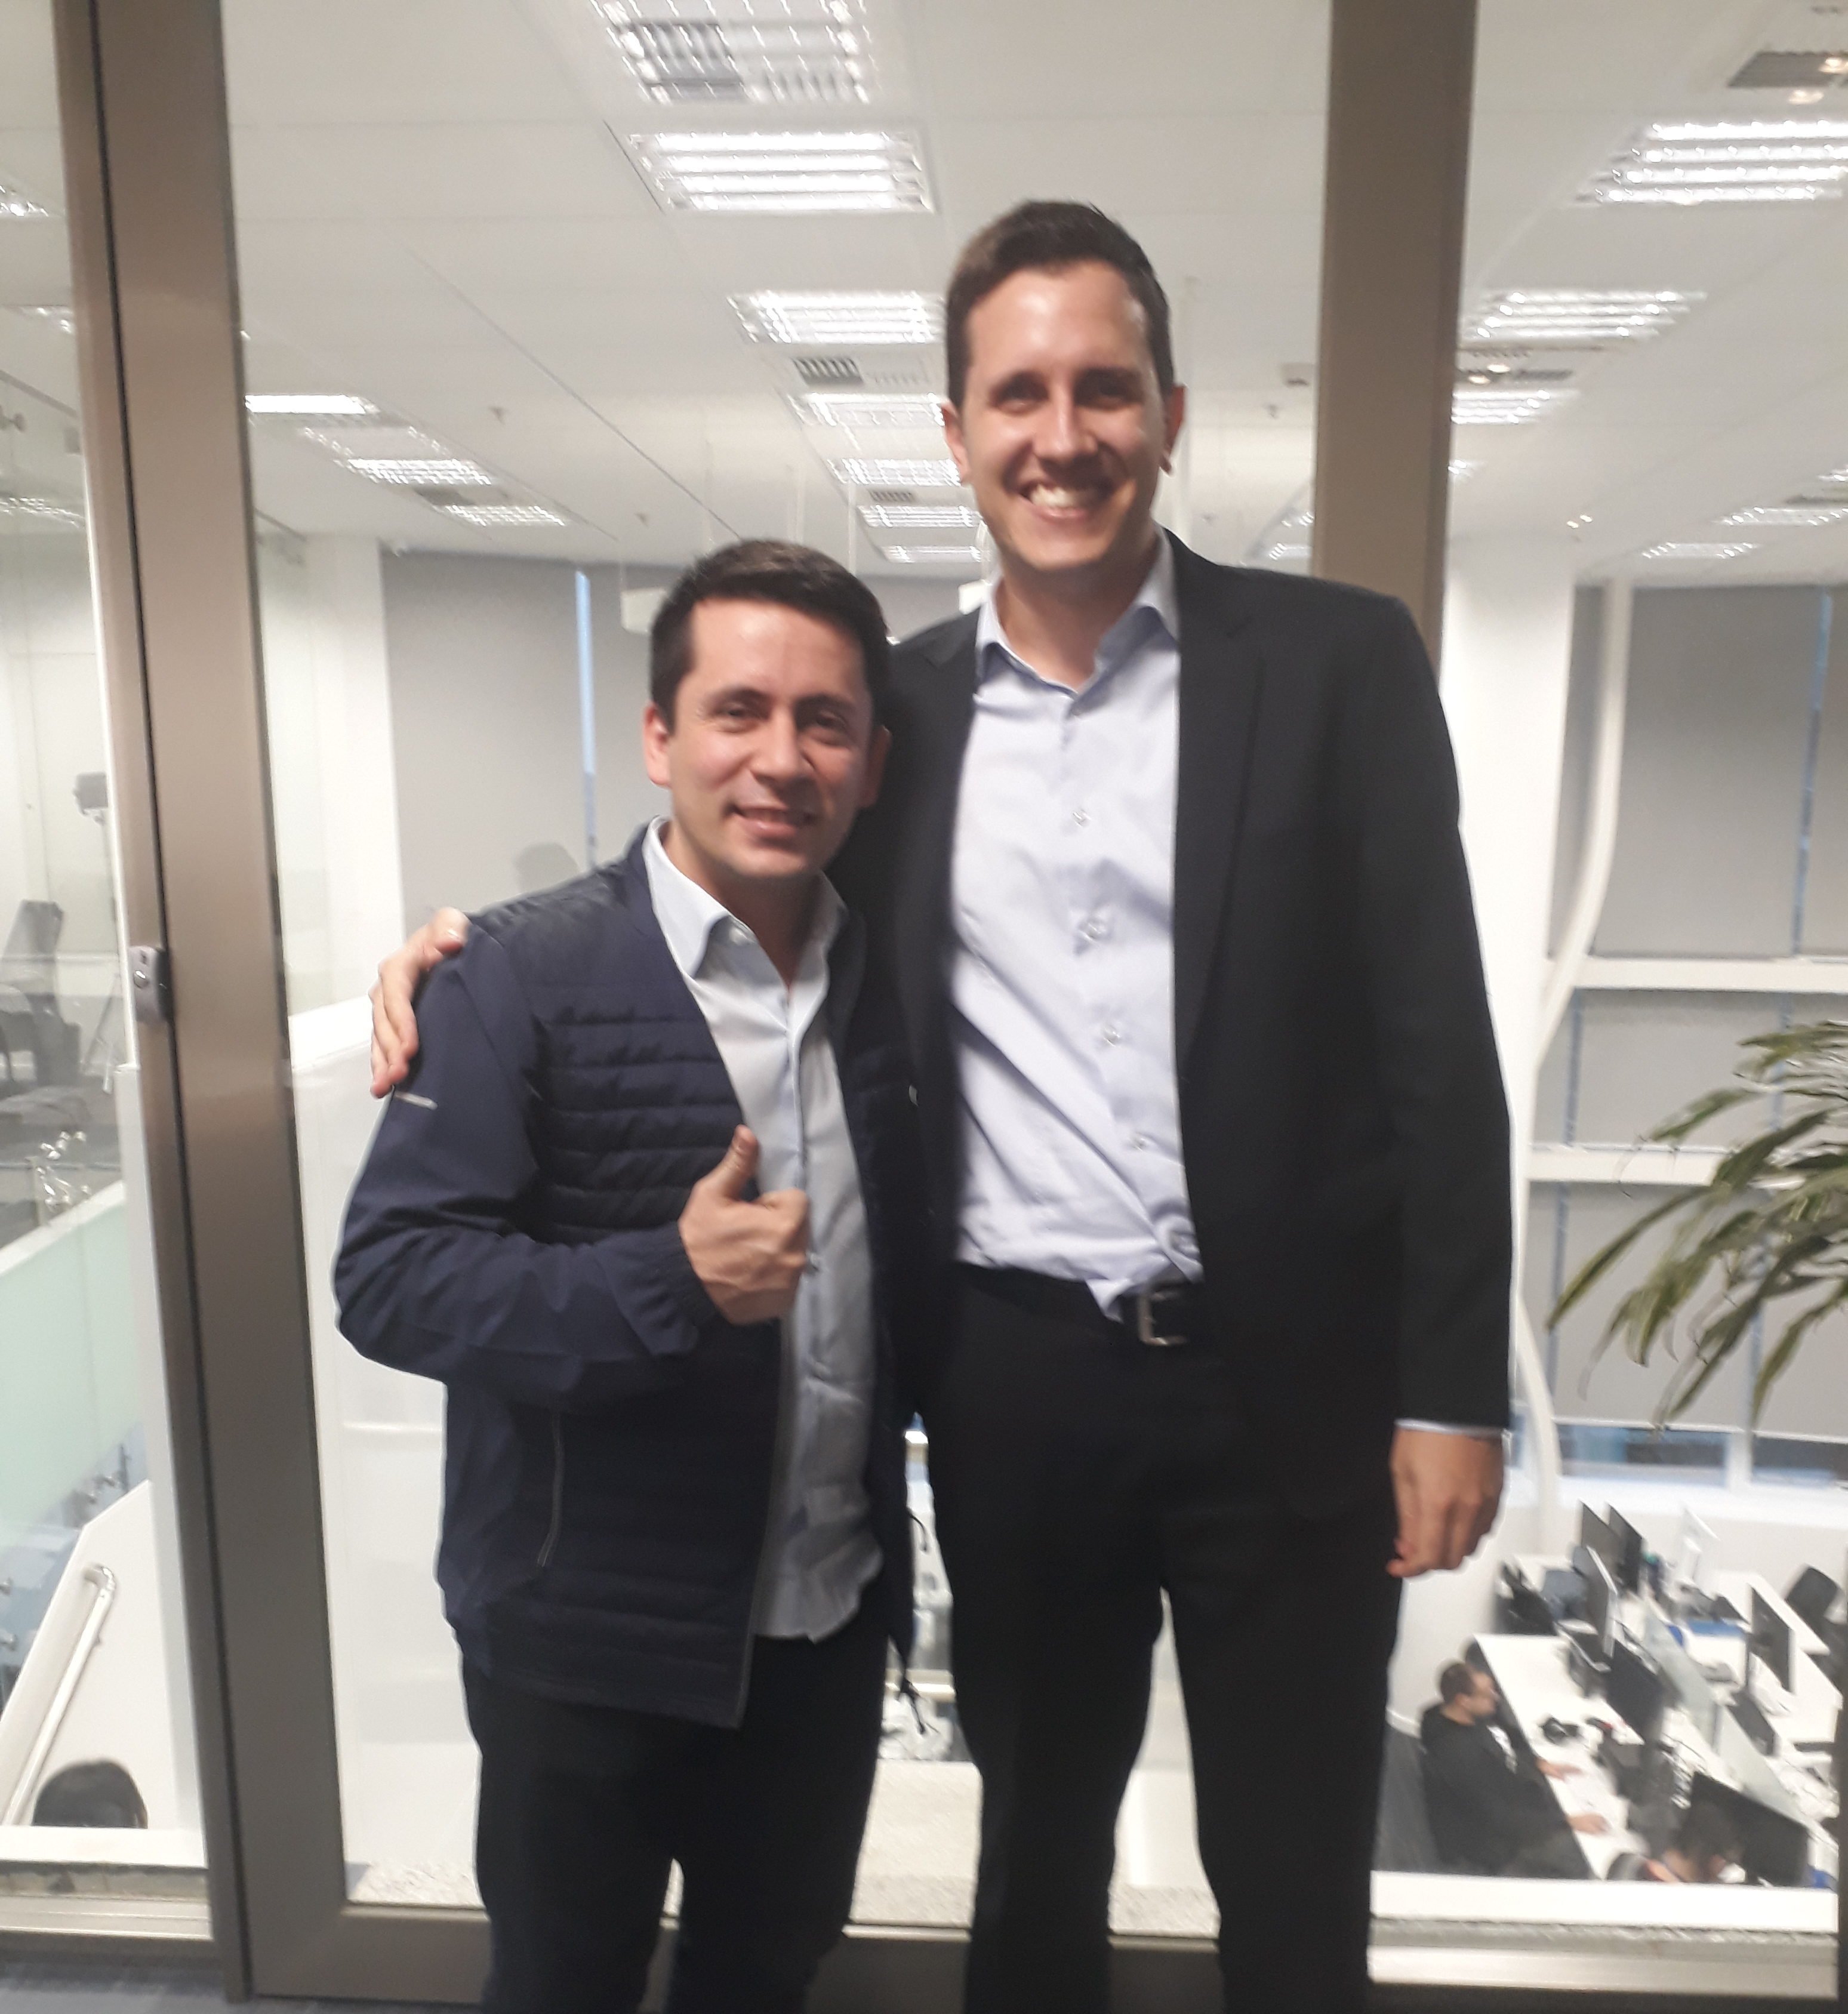 ENTREVISTA: Salvador Neto - Aprovado no concurso ISS Campinas no cargo de Auditor Fiscal